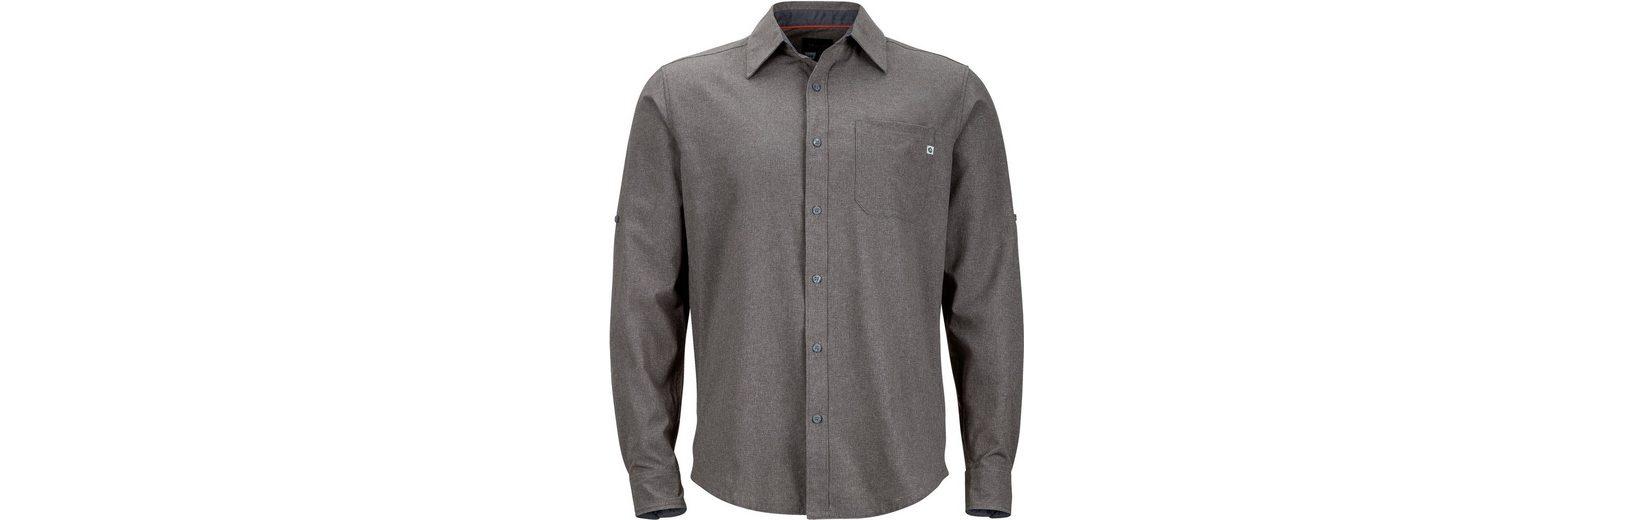 Marmot Bluse Windshear LS Shirt Men